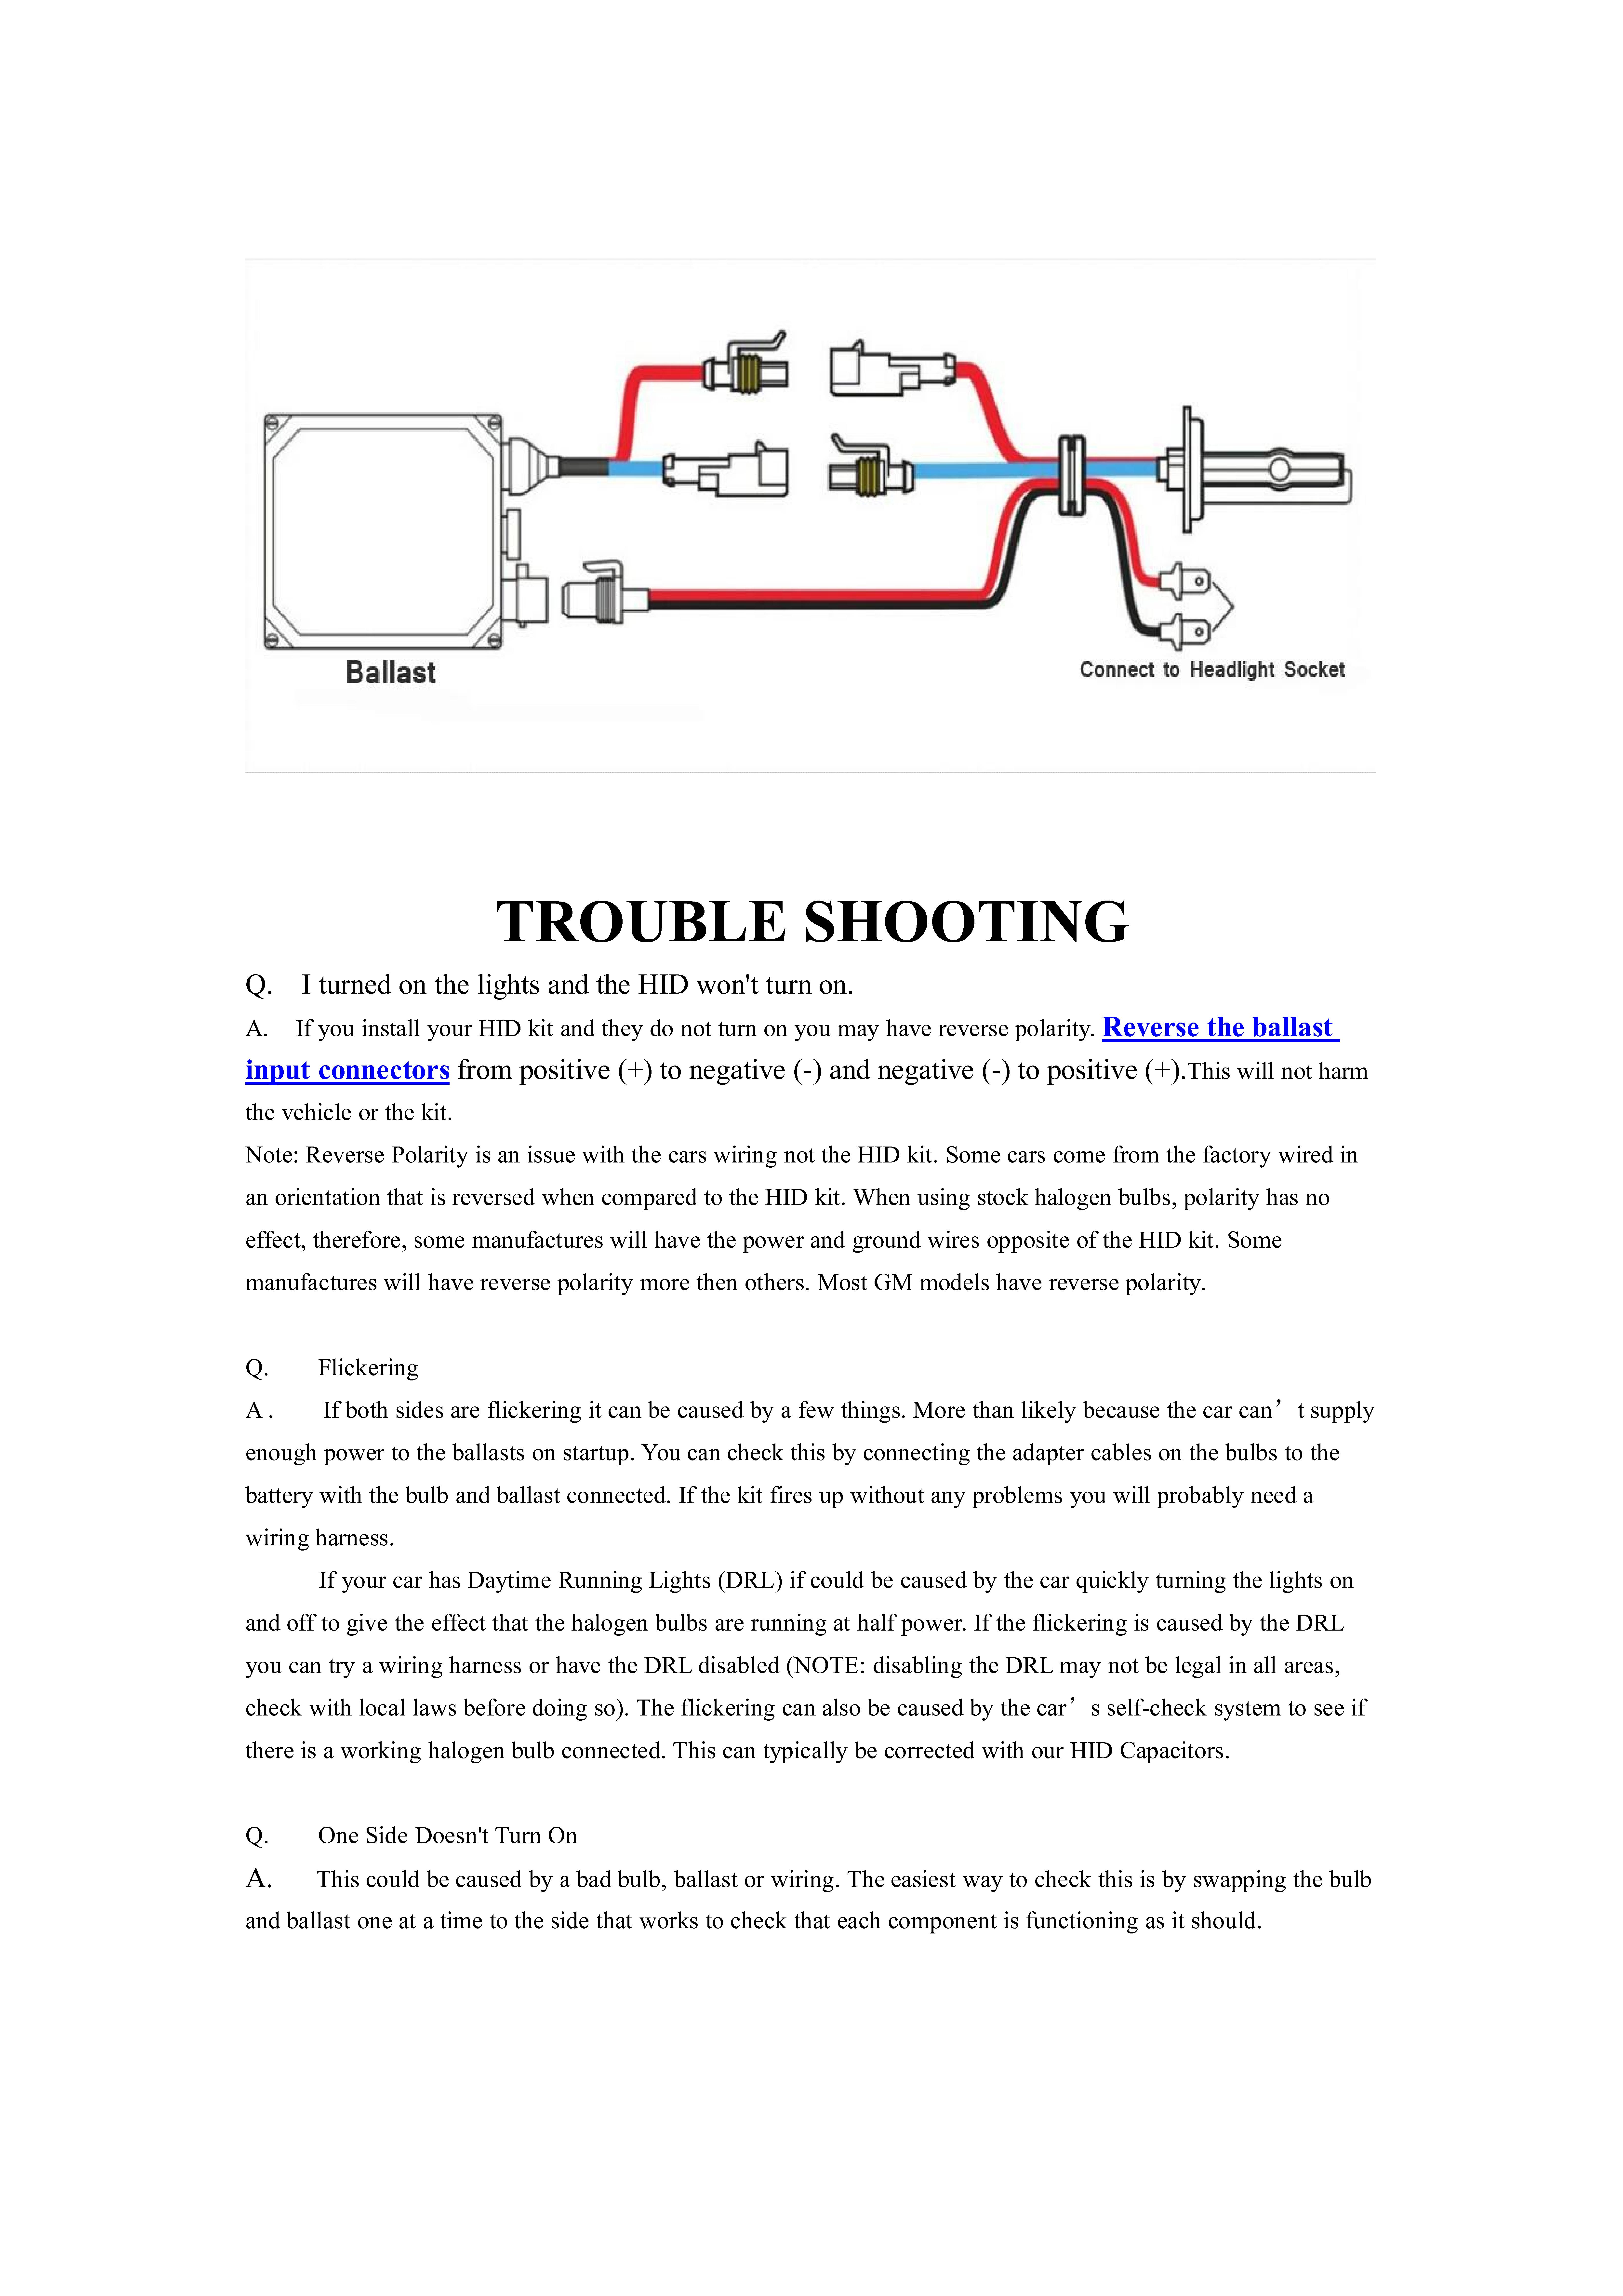 H6054 Wiring Diagram - 2002 Honda Prelude Fuse Diagram -  fuses-boxs.kankubuktikan.jeanjaures37.fr [ 9354 x 6614 Pixel ]